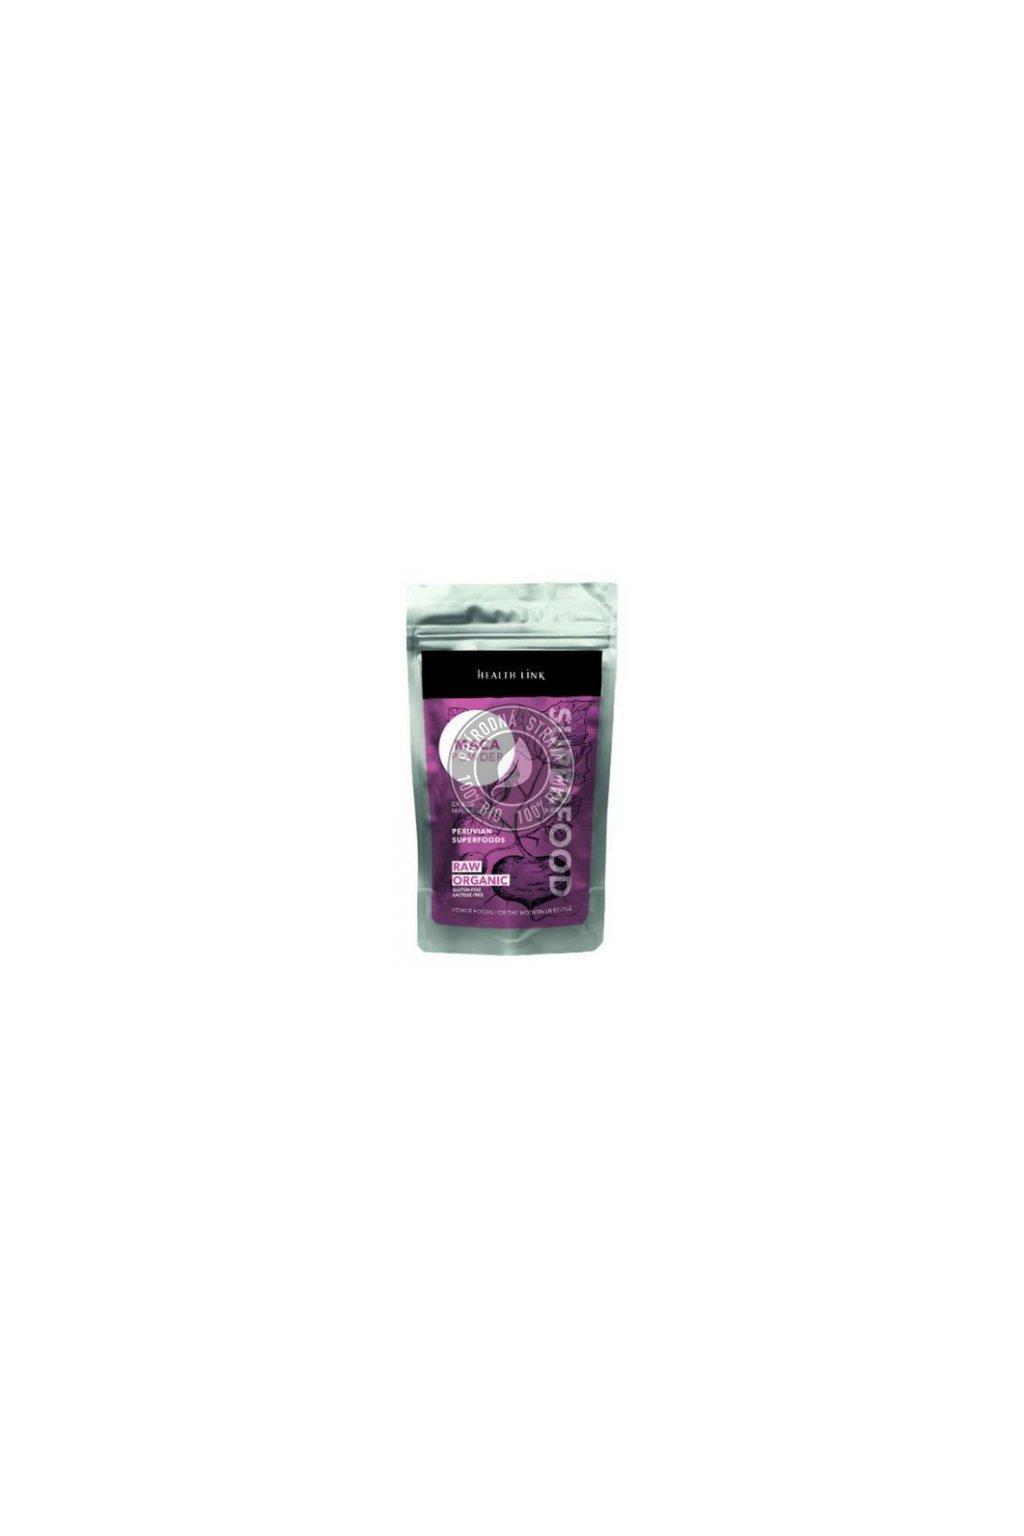 Prášok Maca BIO RAW Health Link  - 120 g